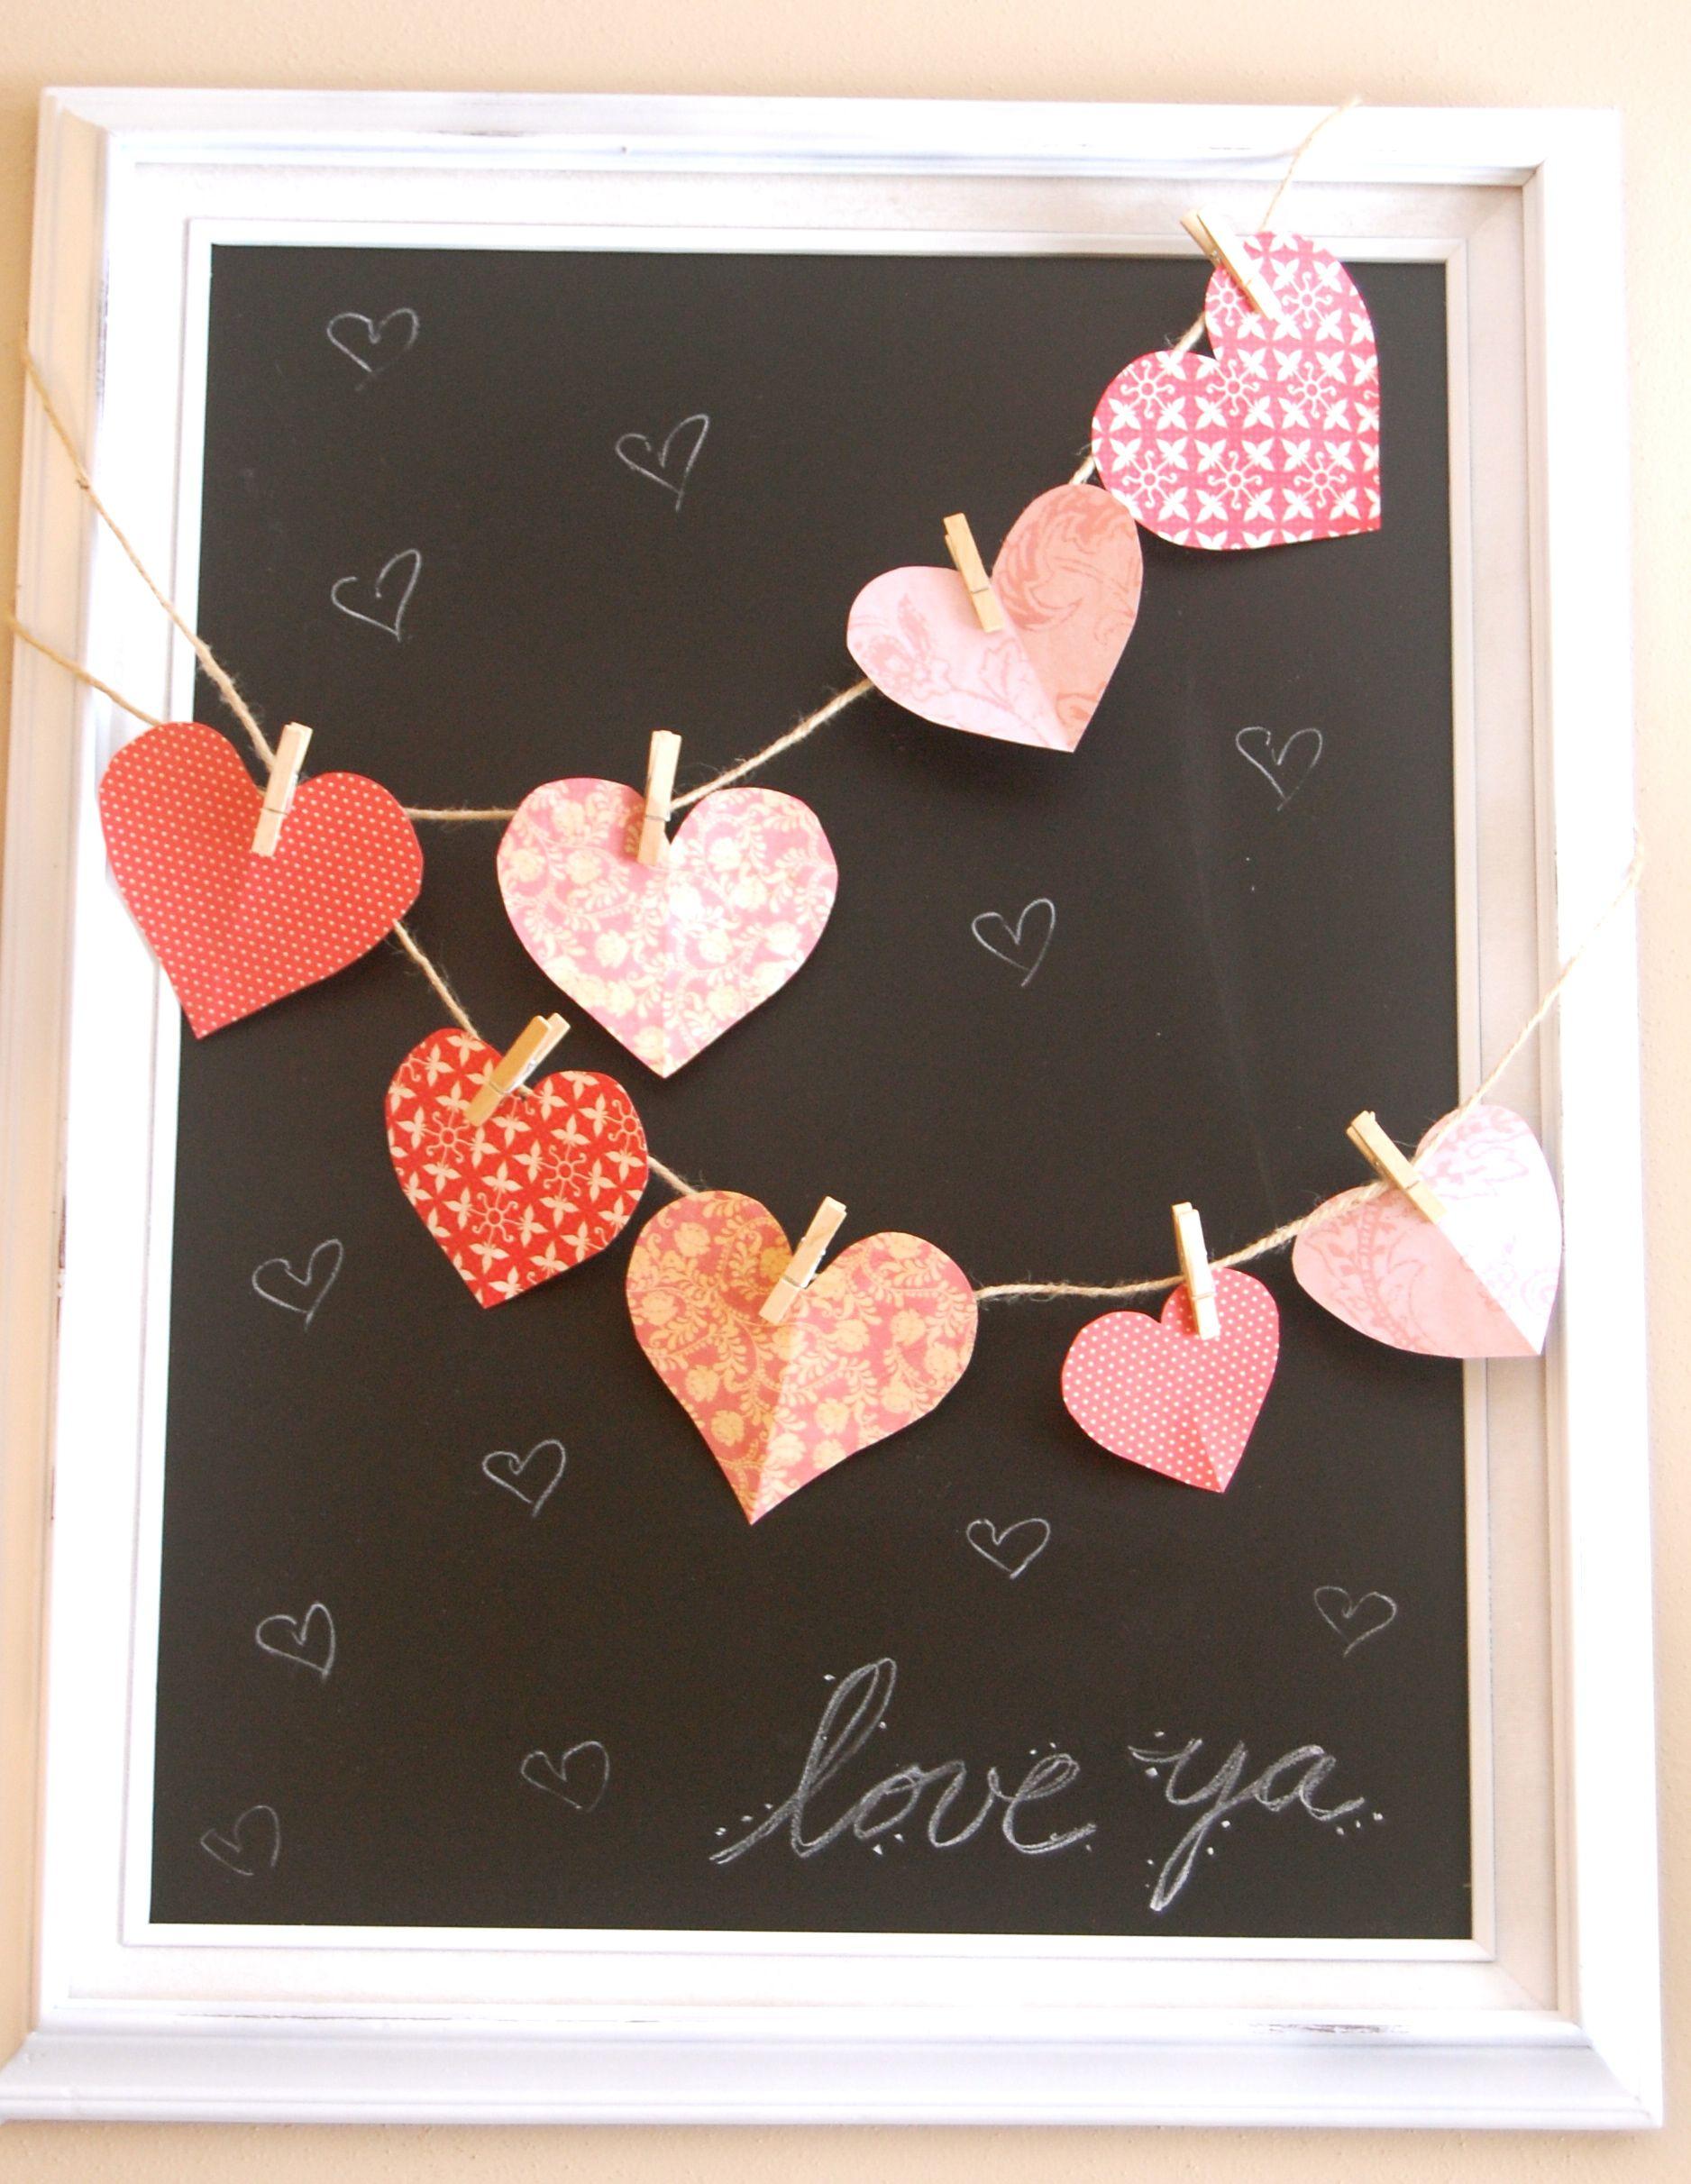 Very Simple Decor Idea To Bri G The Heart Inside I Like Hanging